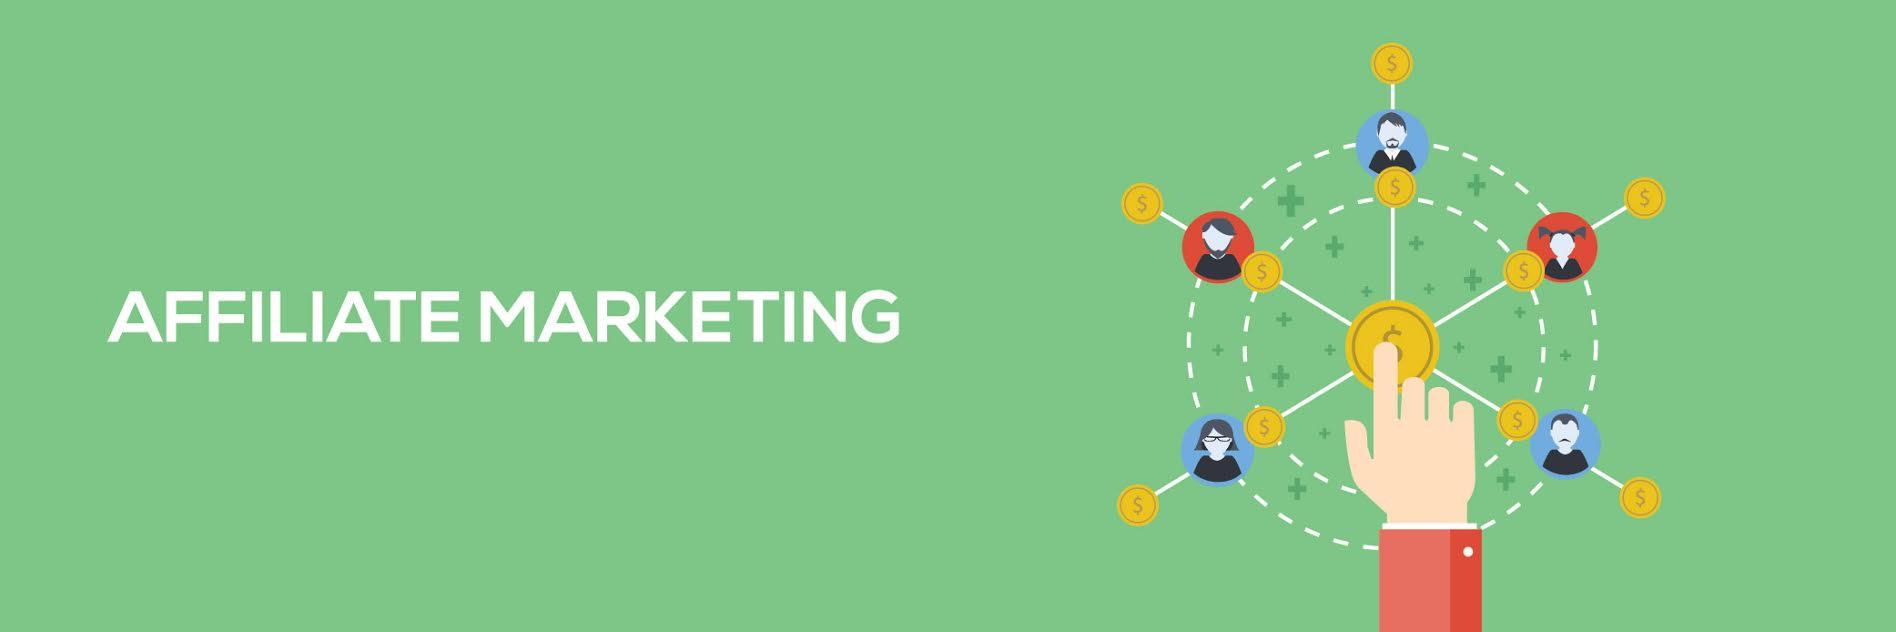 marketing_affiliation.jpg